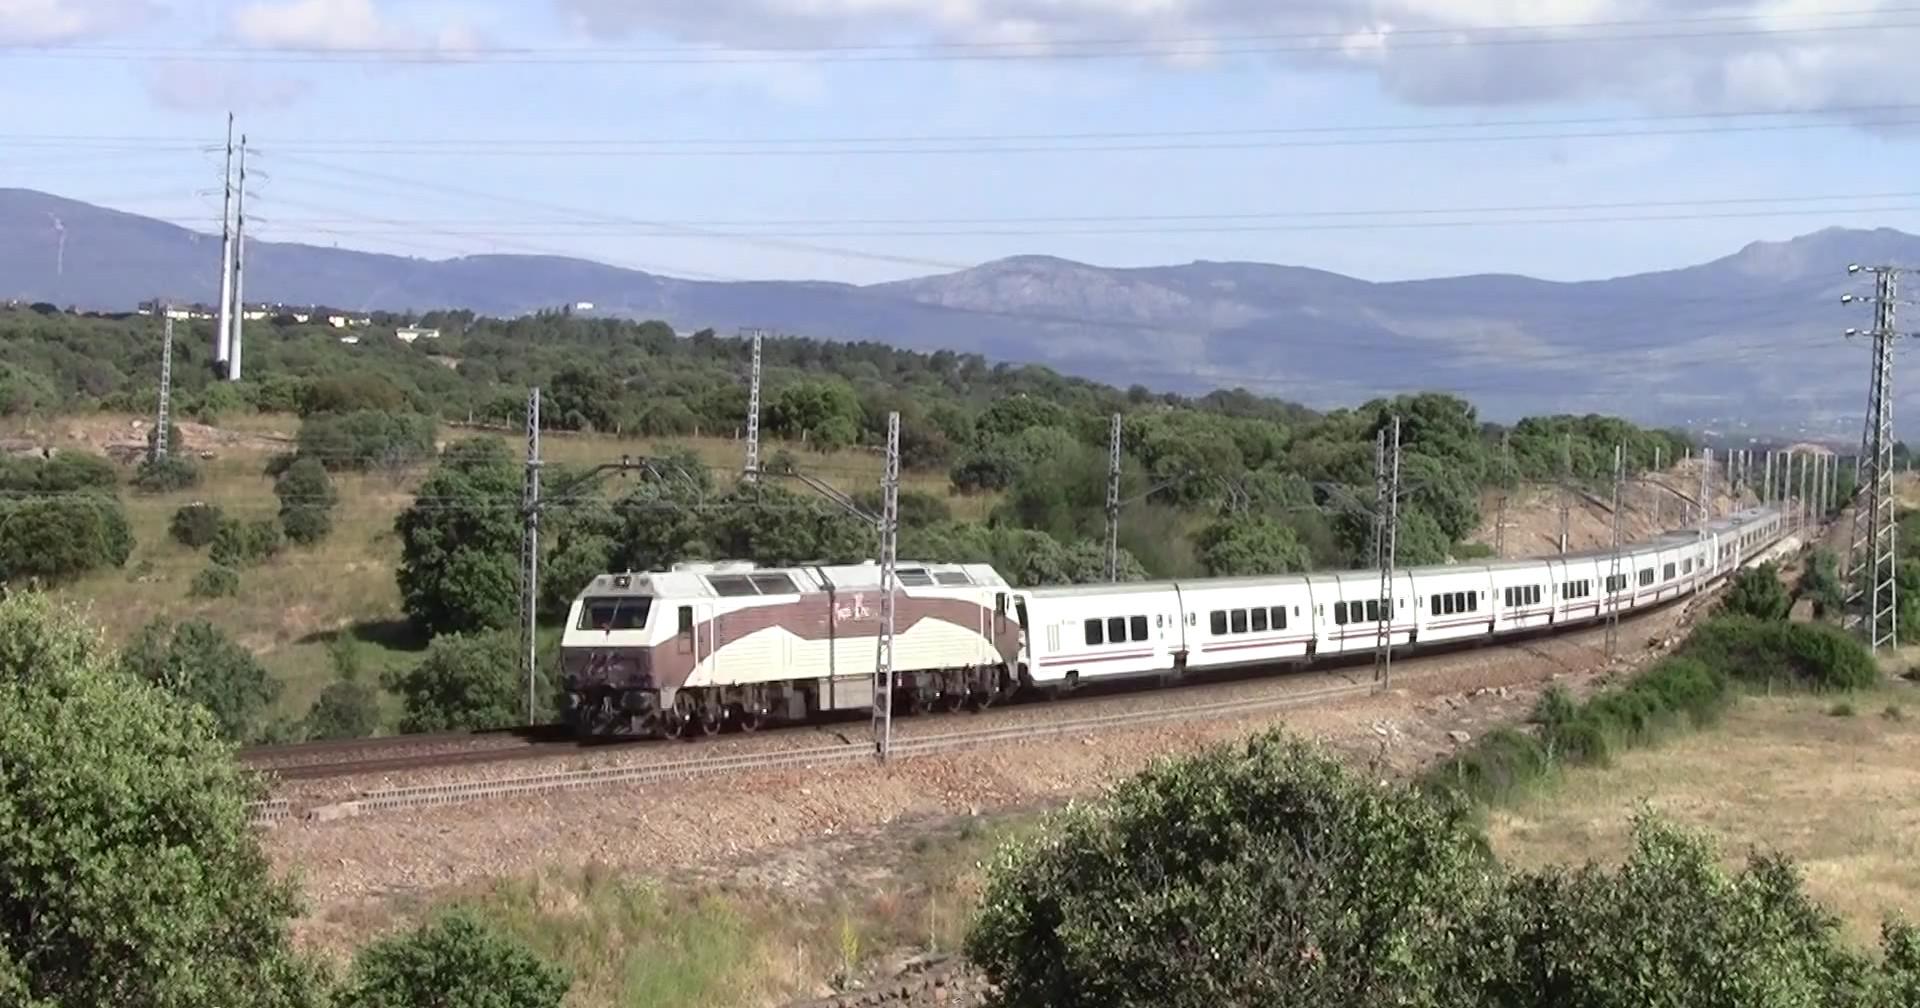 Fotograma en el que se ve a la 333-407 del Tren de la Fresa remolcando al Talgo de la Champions